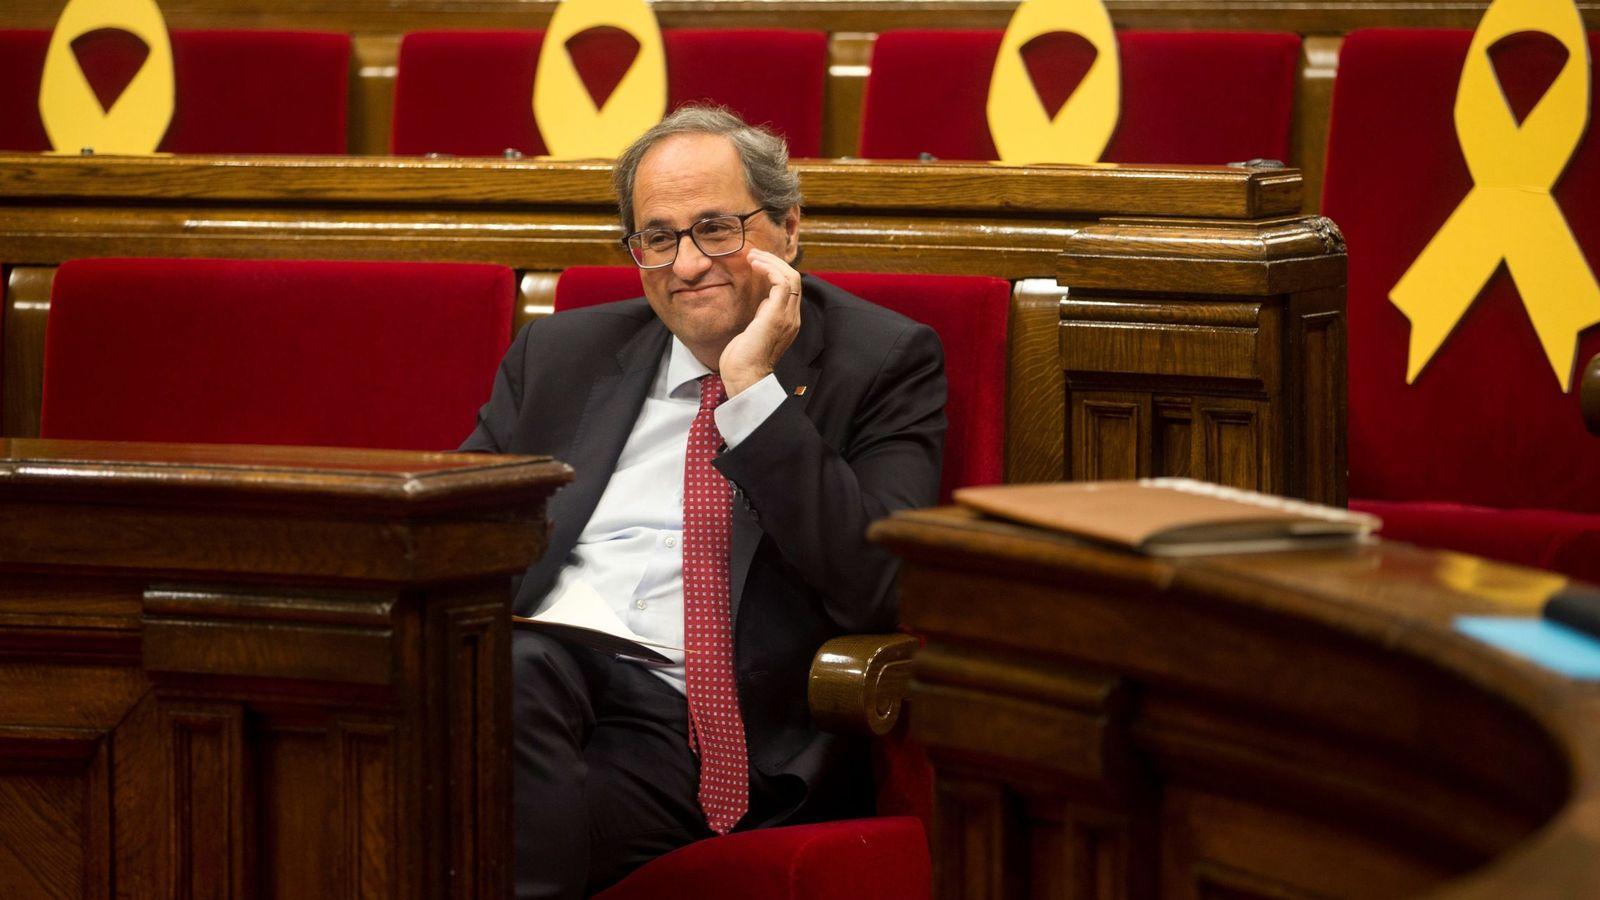 Quim Torra decreta dos días de duelo en Cataluña por la tragedia de Mallorca